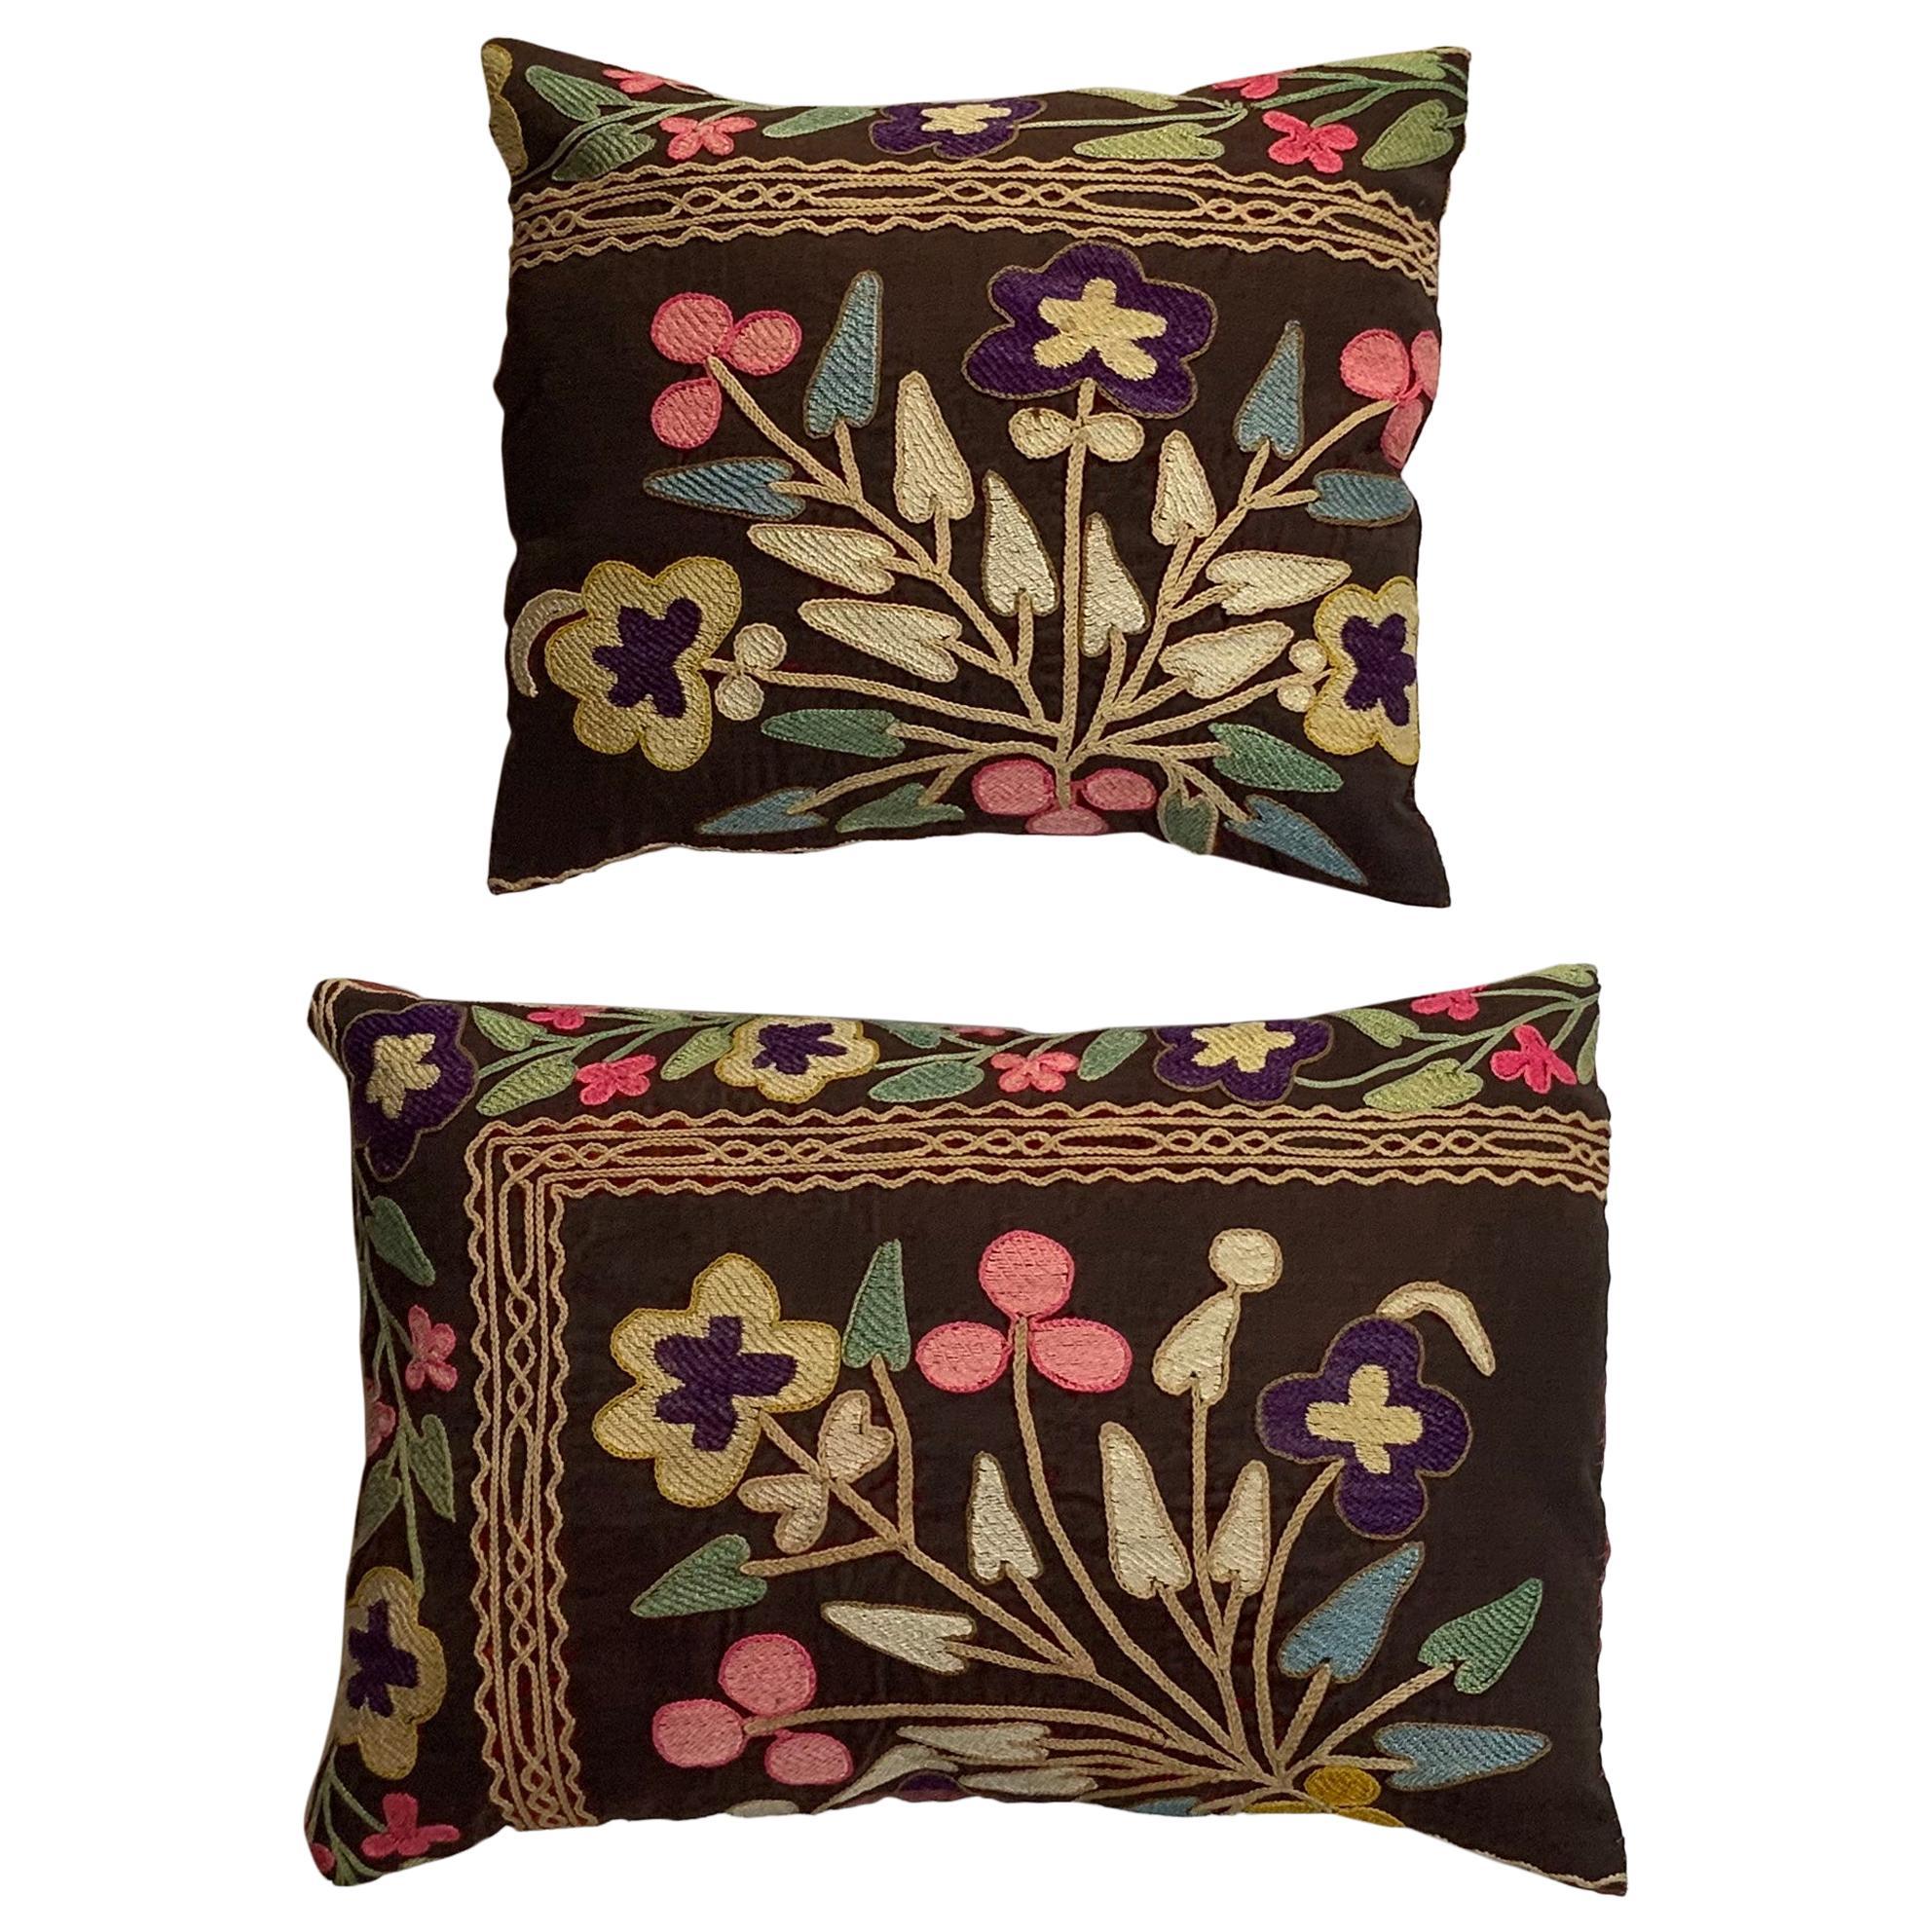 Pair of Antique Suzani Pillows